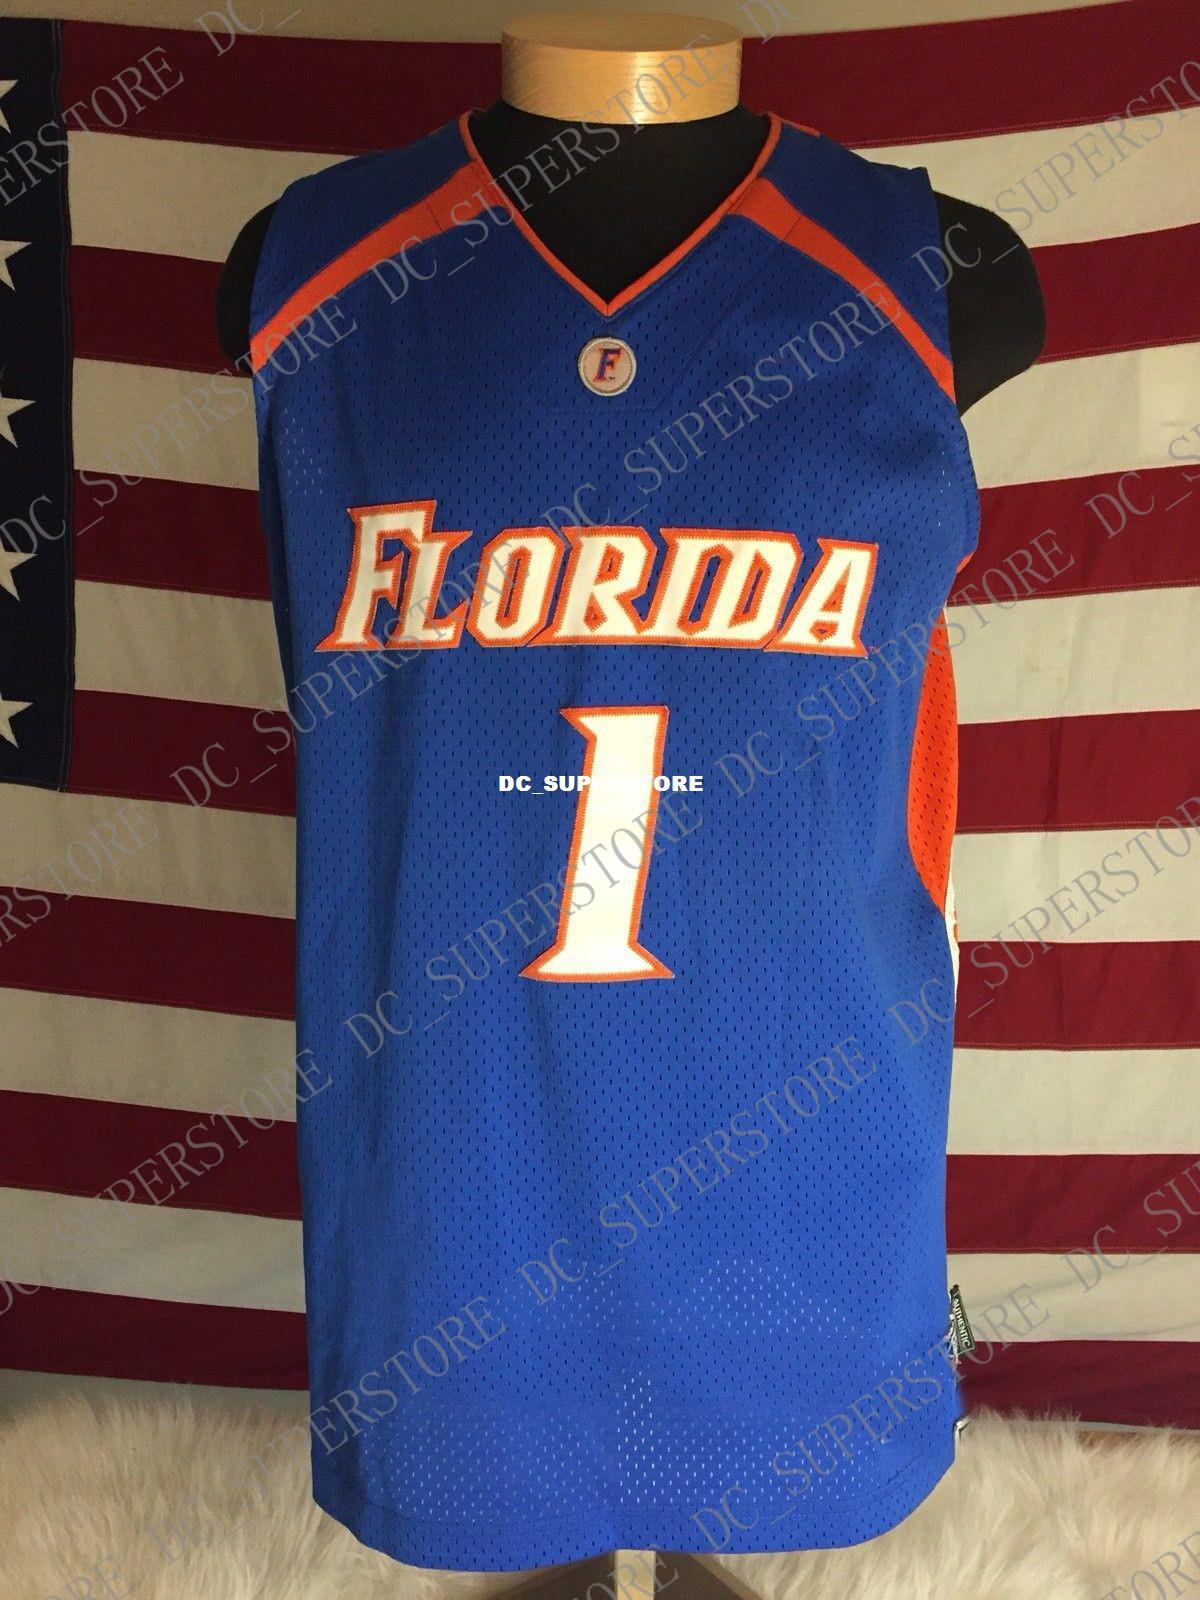 check out 4e3e5 a52e0 Cheap custom Florida Gators Blue Orange Basketball Jersey #1 Stitched  Customize any number name MEN WOMEN YOUTH XS-5XL